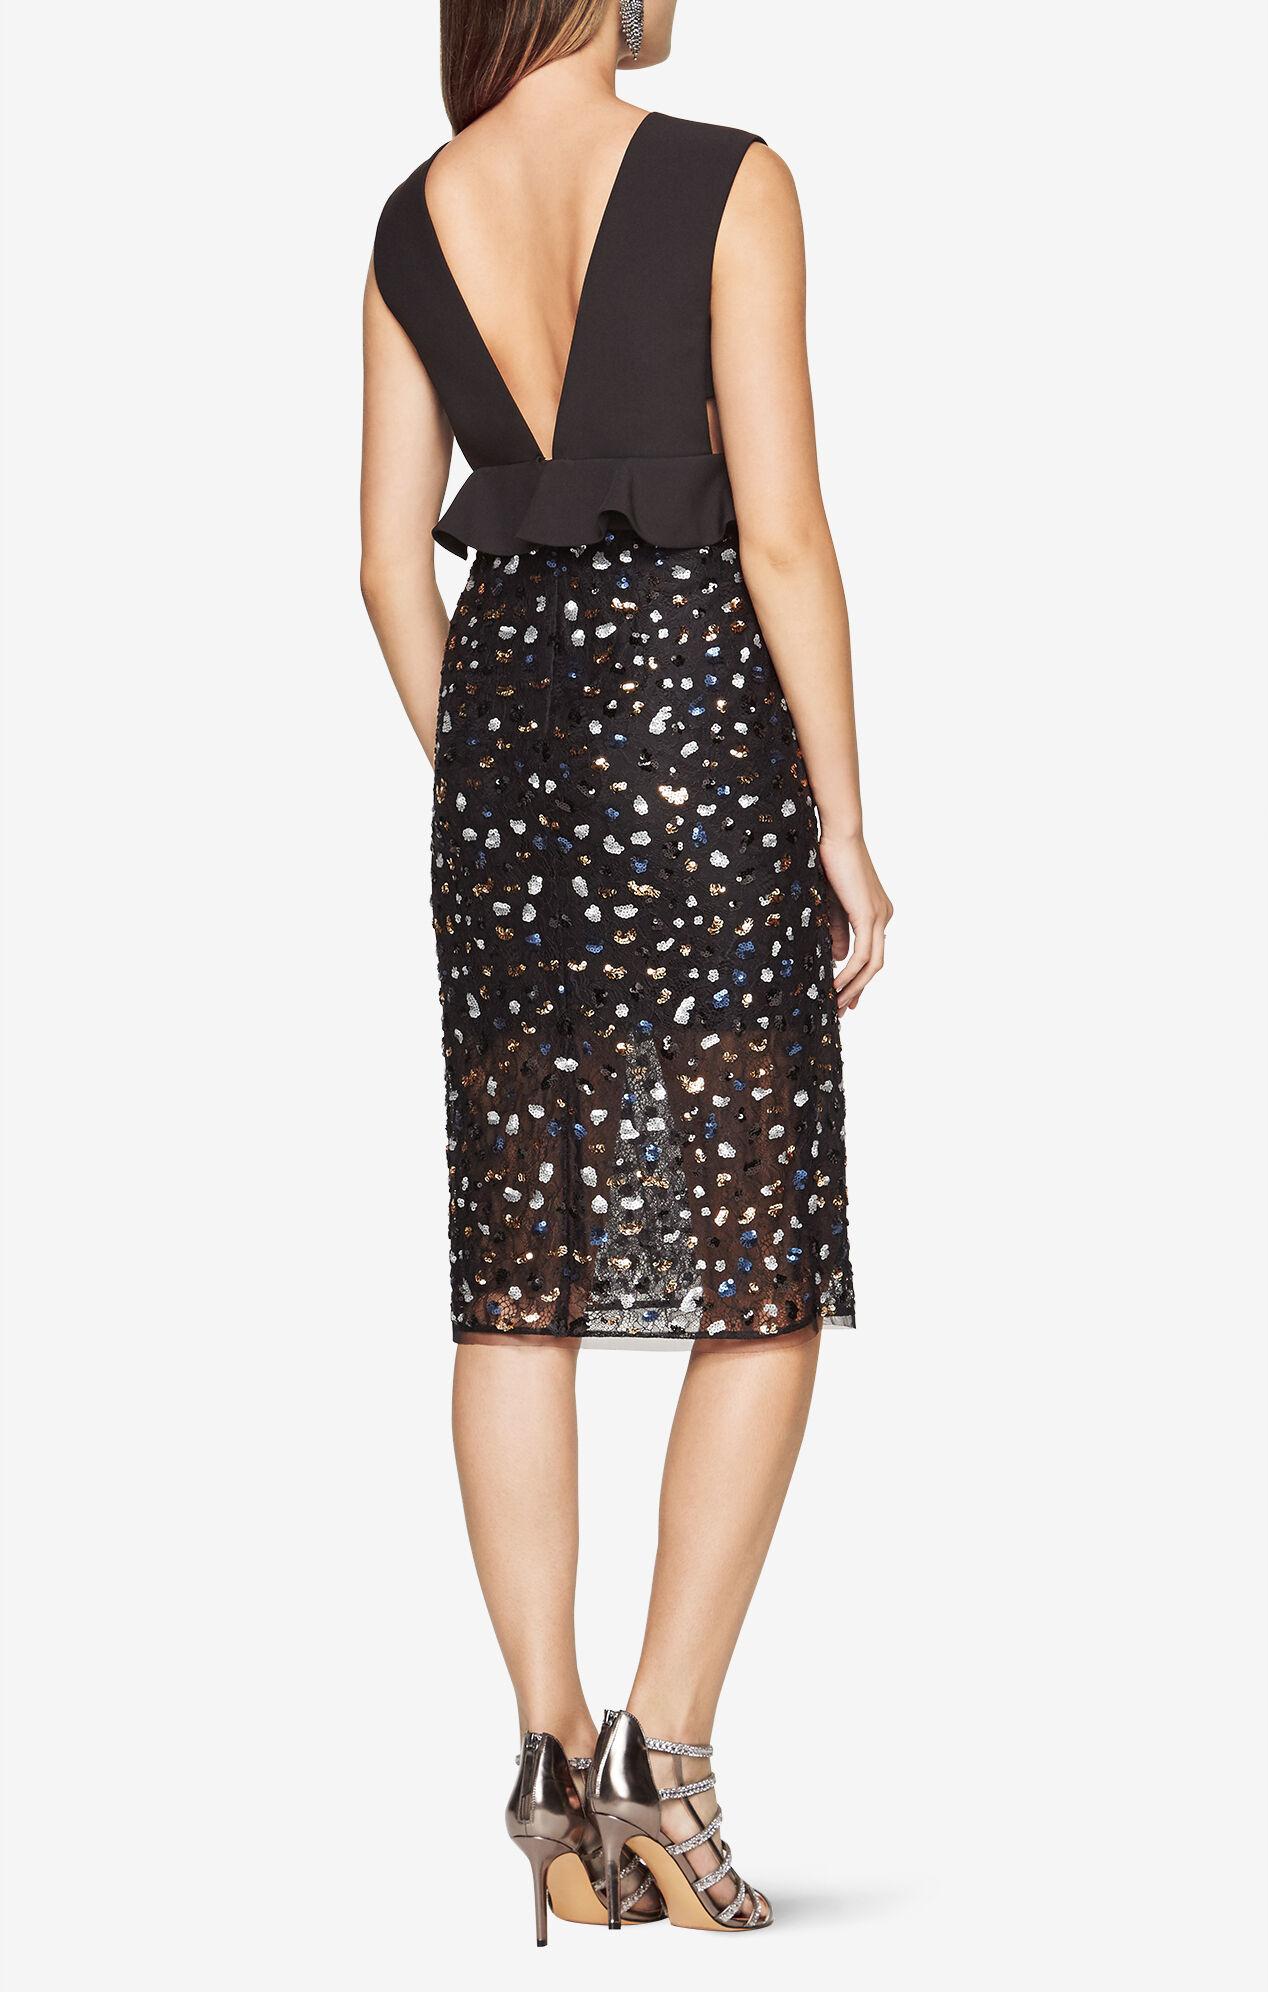 Sequined Peplum Dress